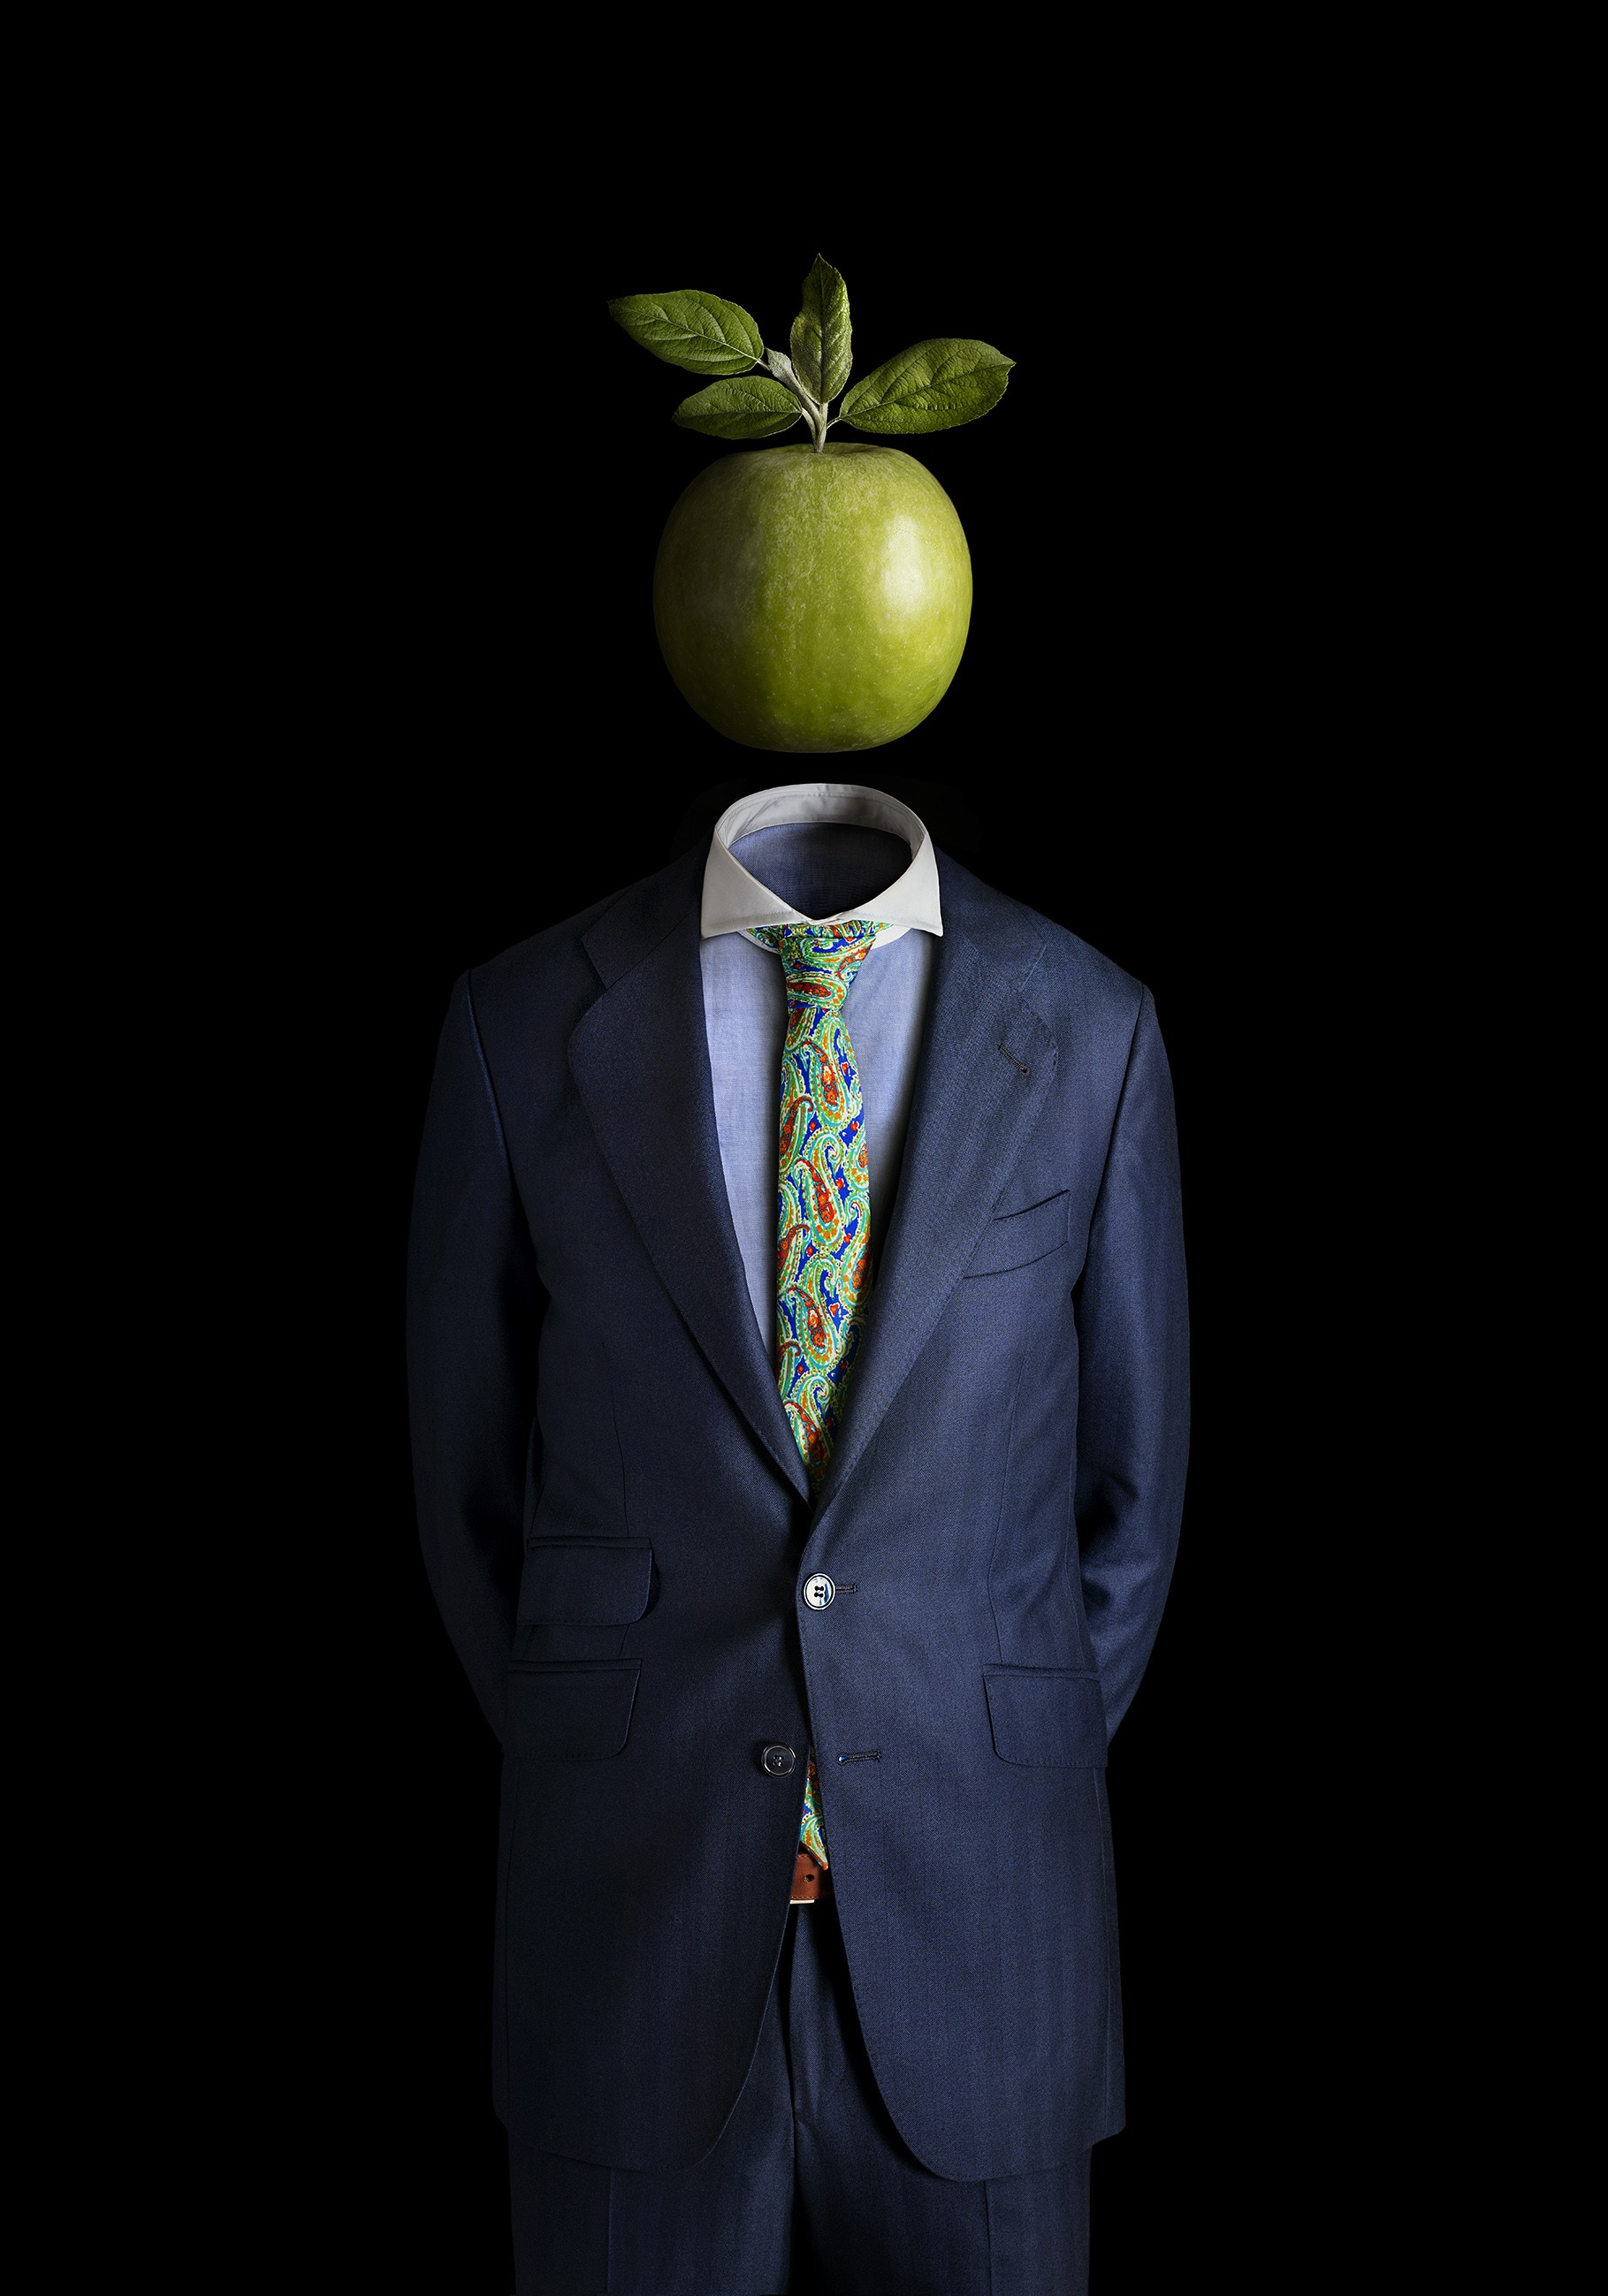 Miguel Vallinas Prieto, Ceci n'est pas une pomme, 2017, £1400, c-type, My Life in Art